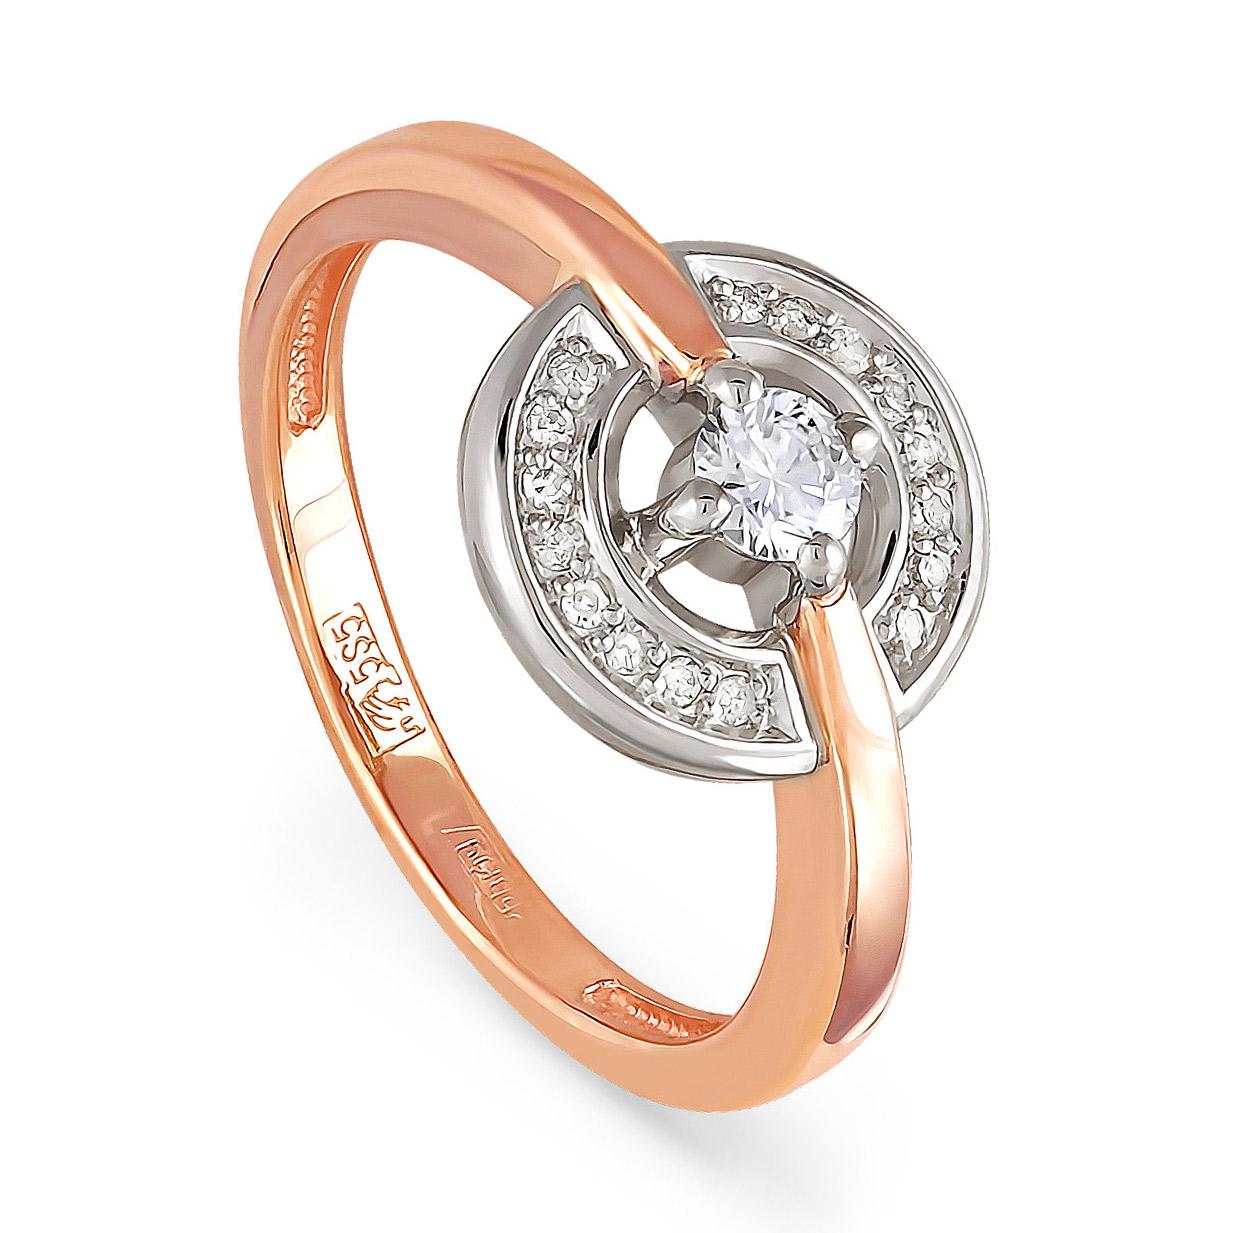 Золотое кольцо Бриллиант арт. 11-0766-1000 11-0766-1000